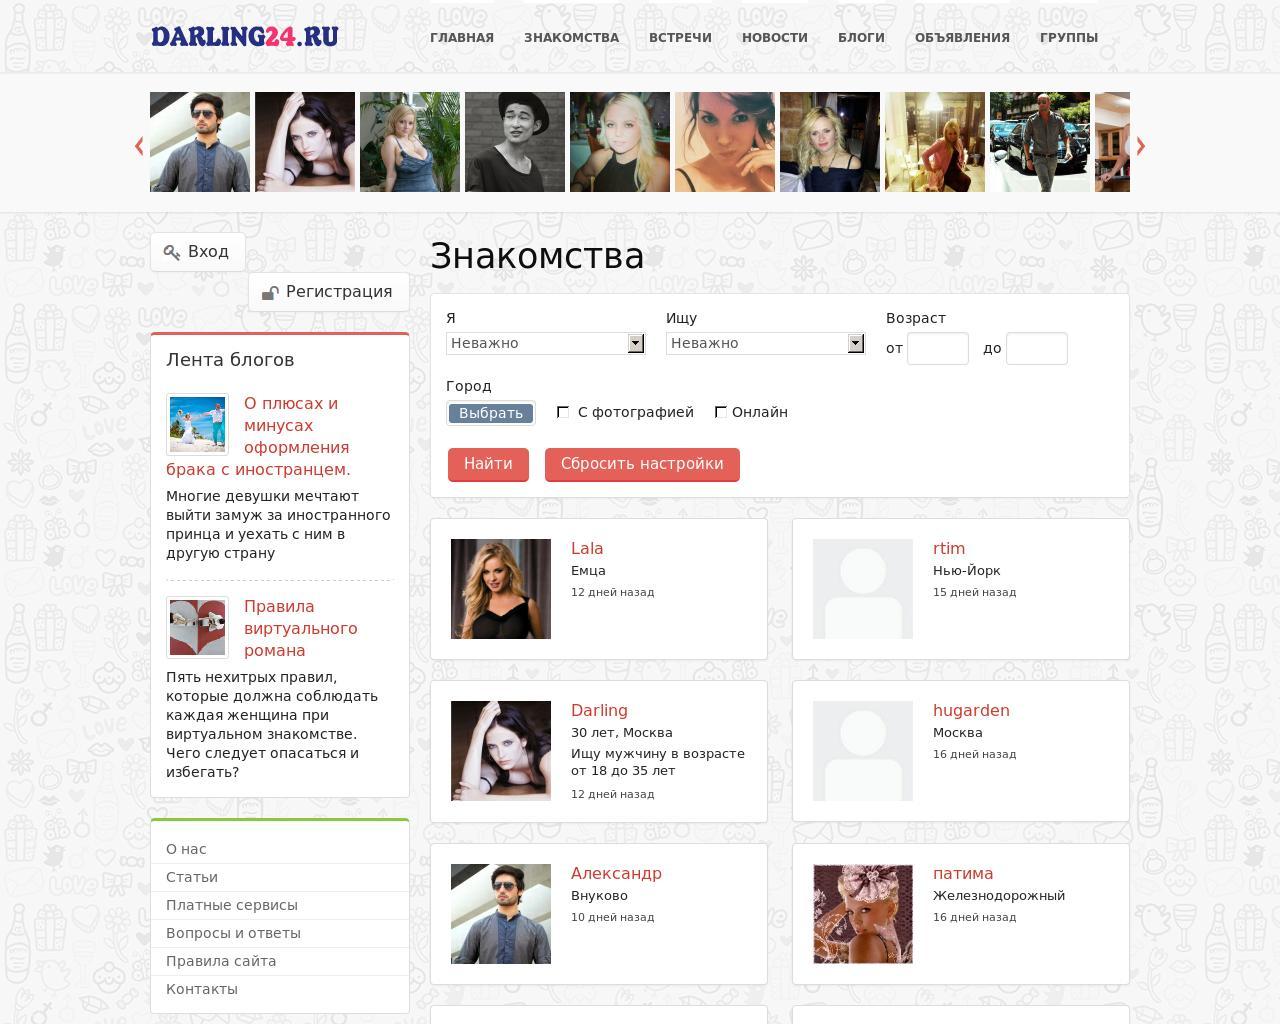 Виртуальные сайты знакомства